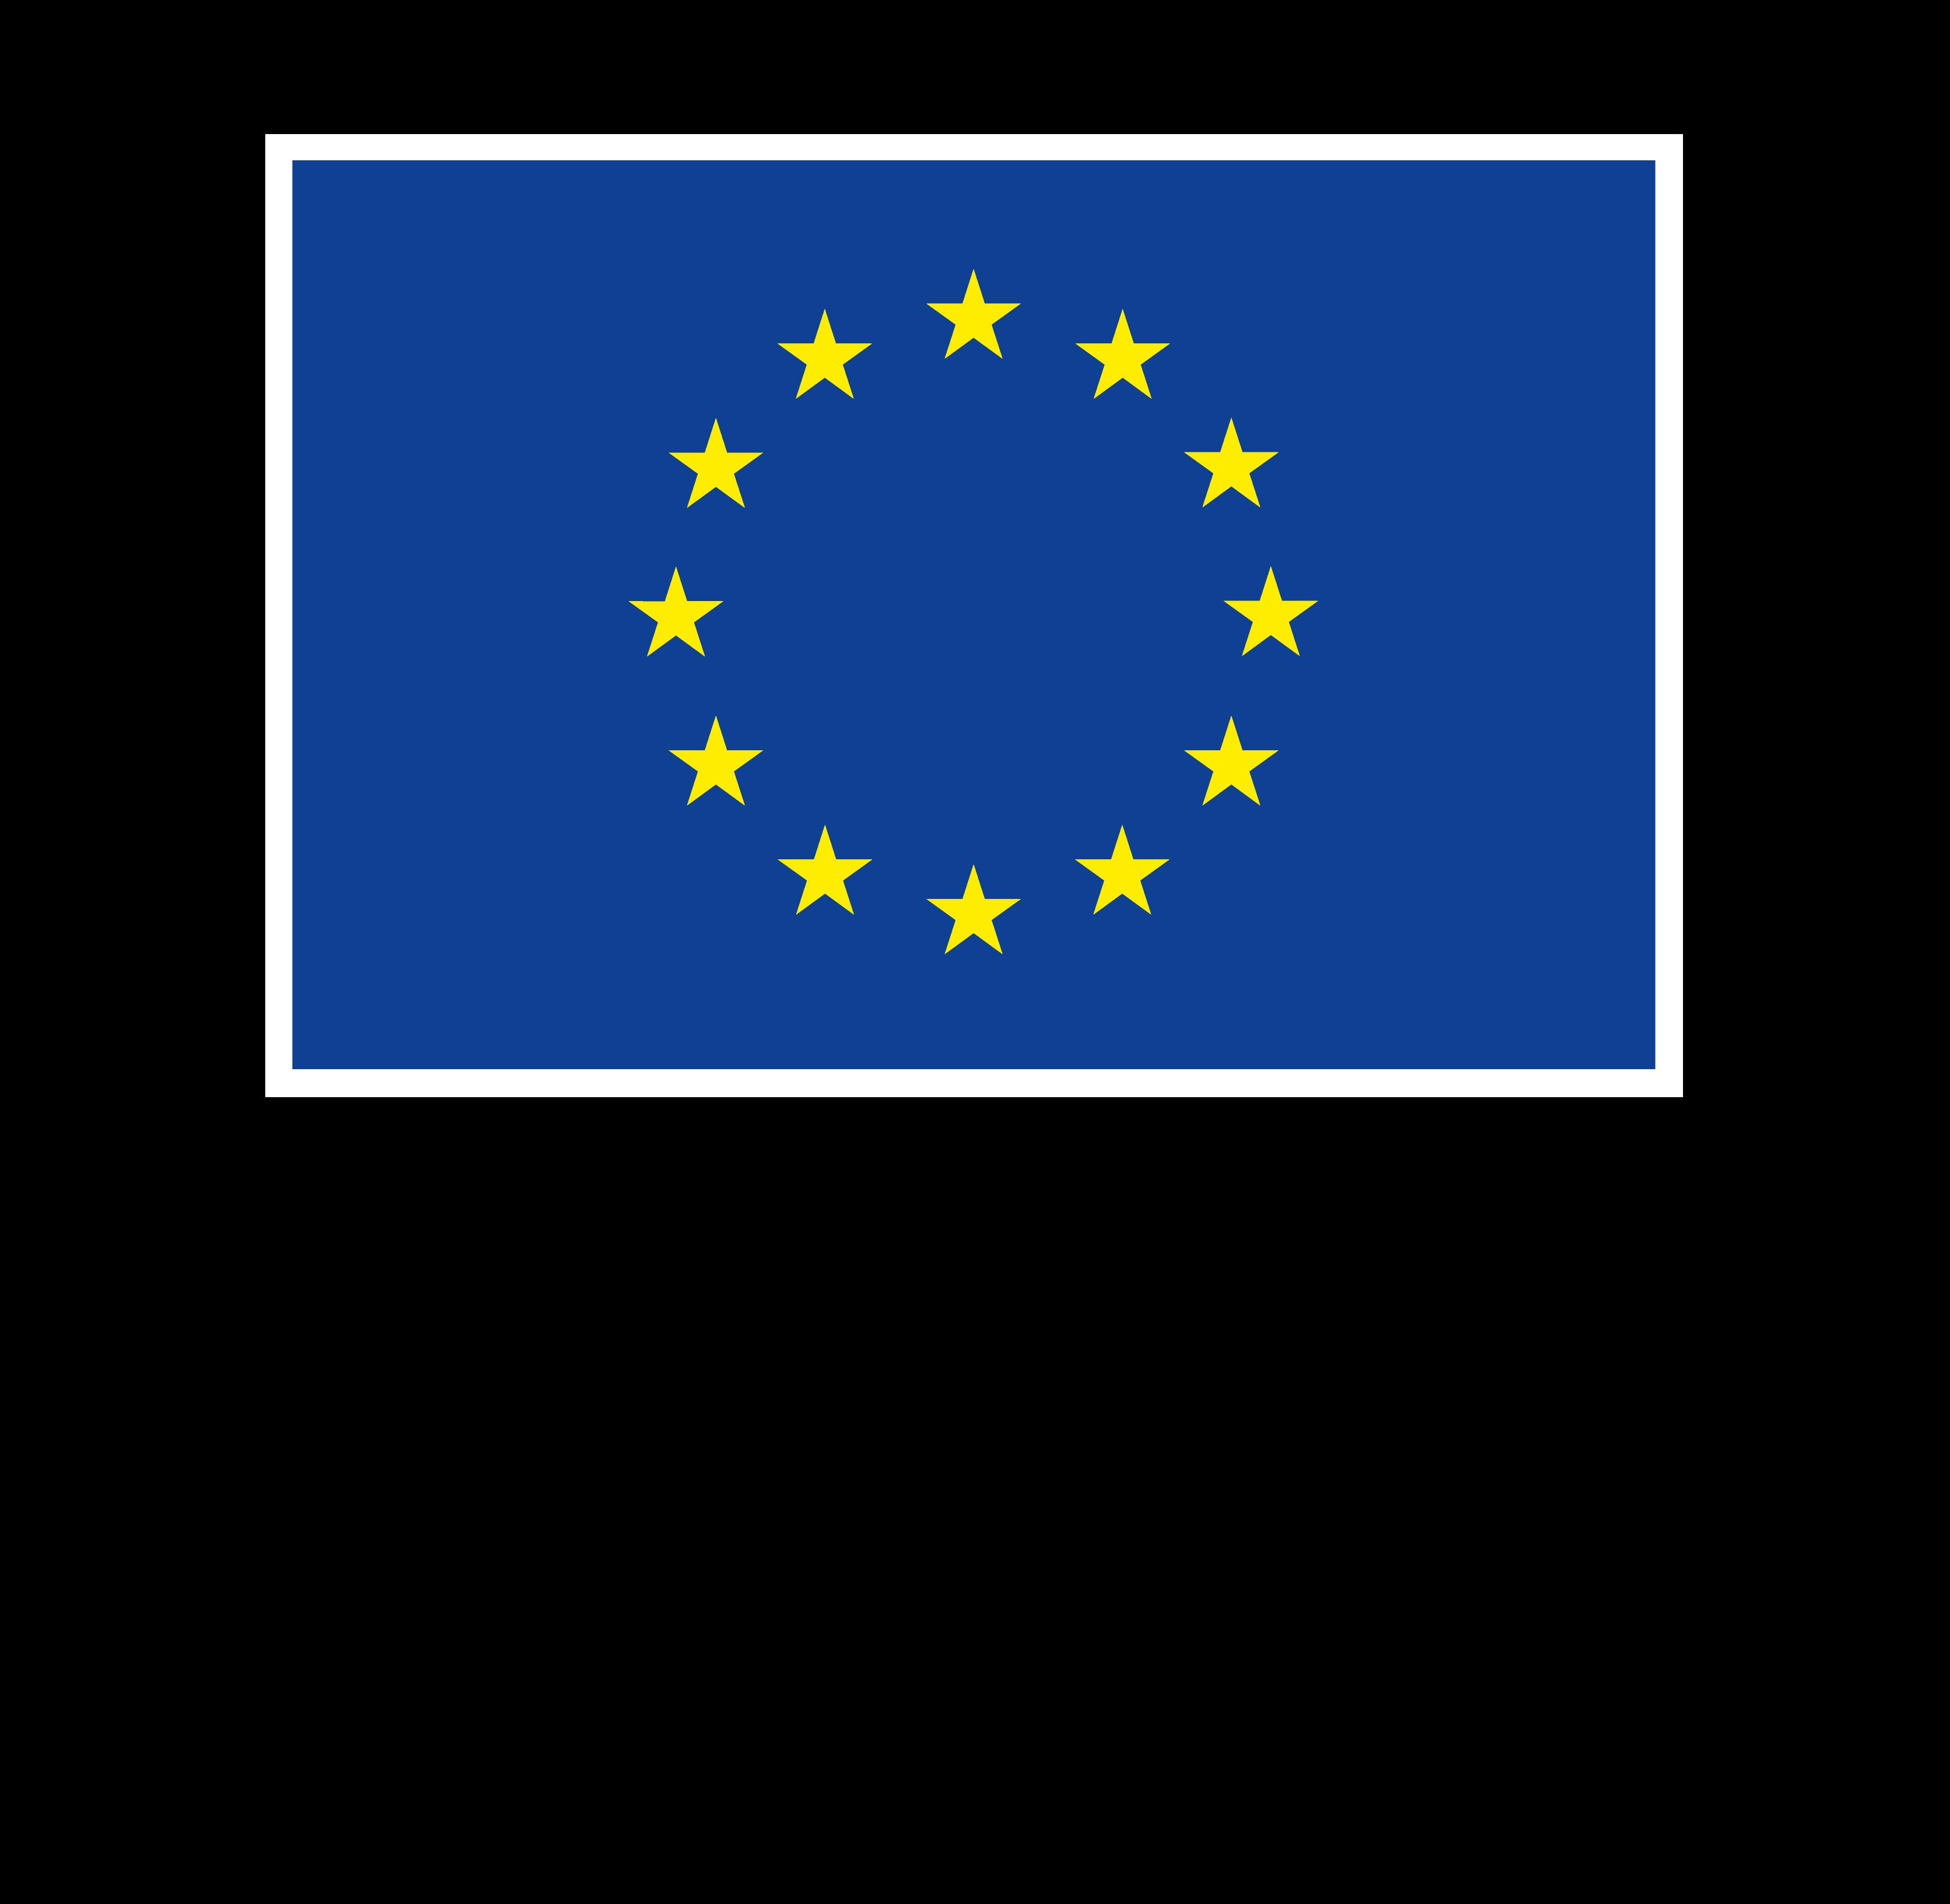 logo-union-europea-proteccion-civil-ayuda-humanitaria